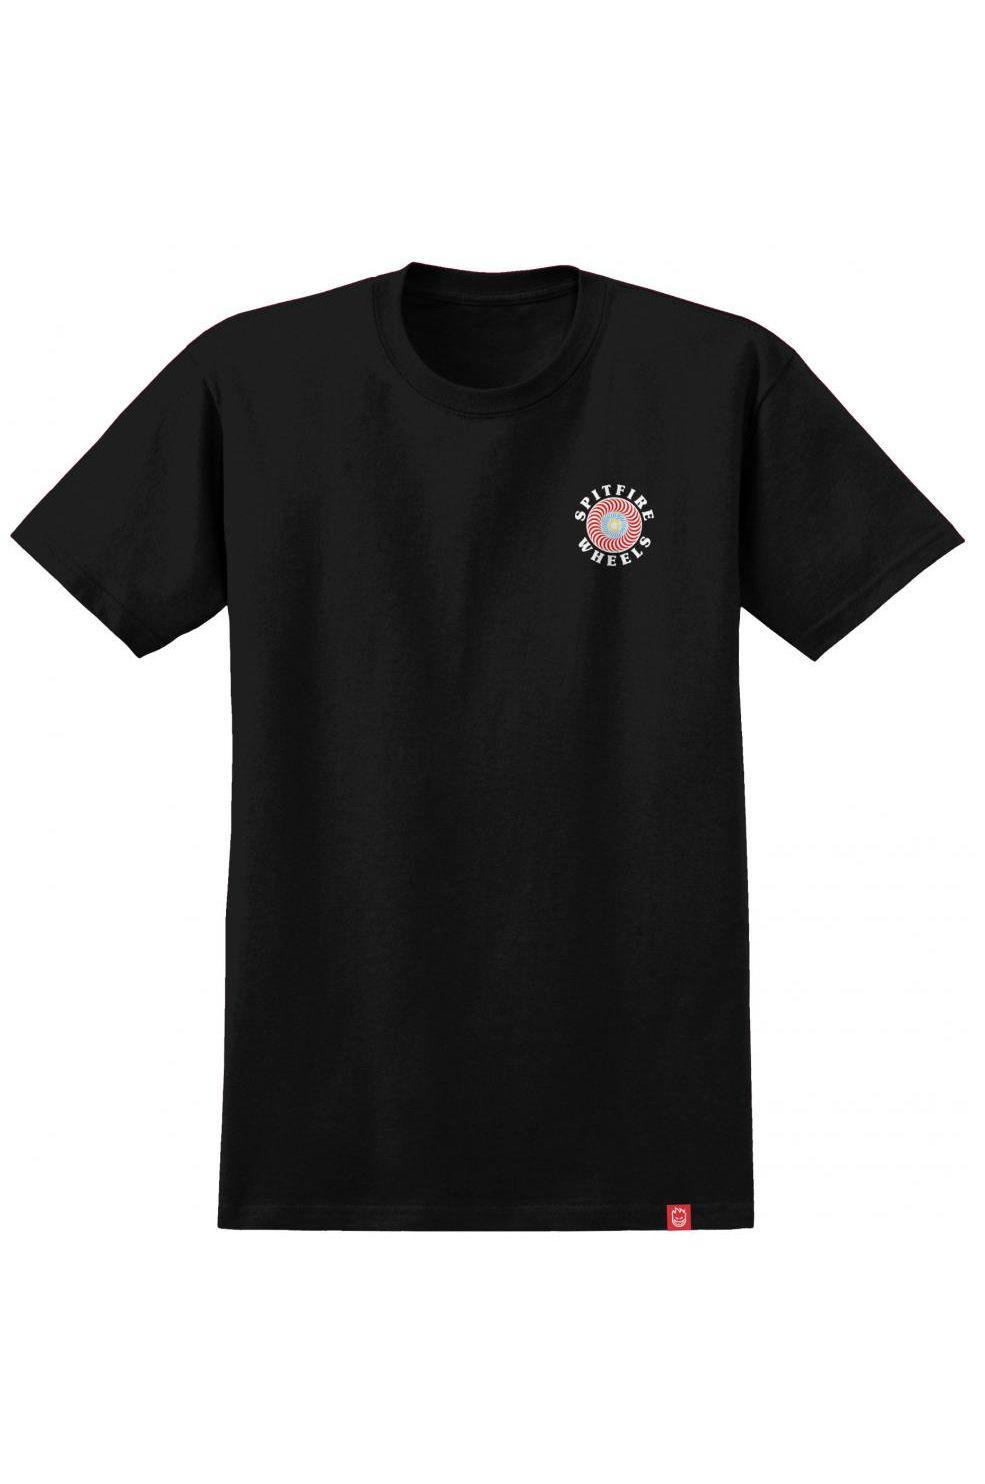 Spitfire T-Shirt OG CLASSIC FILL Black/Multi-Colored